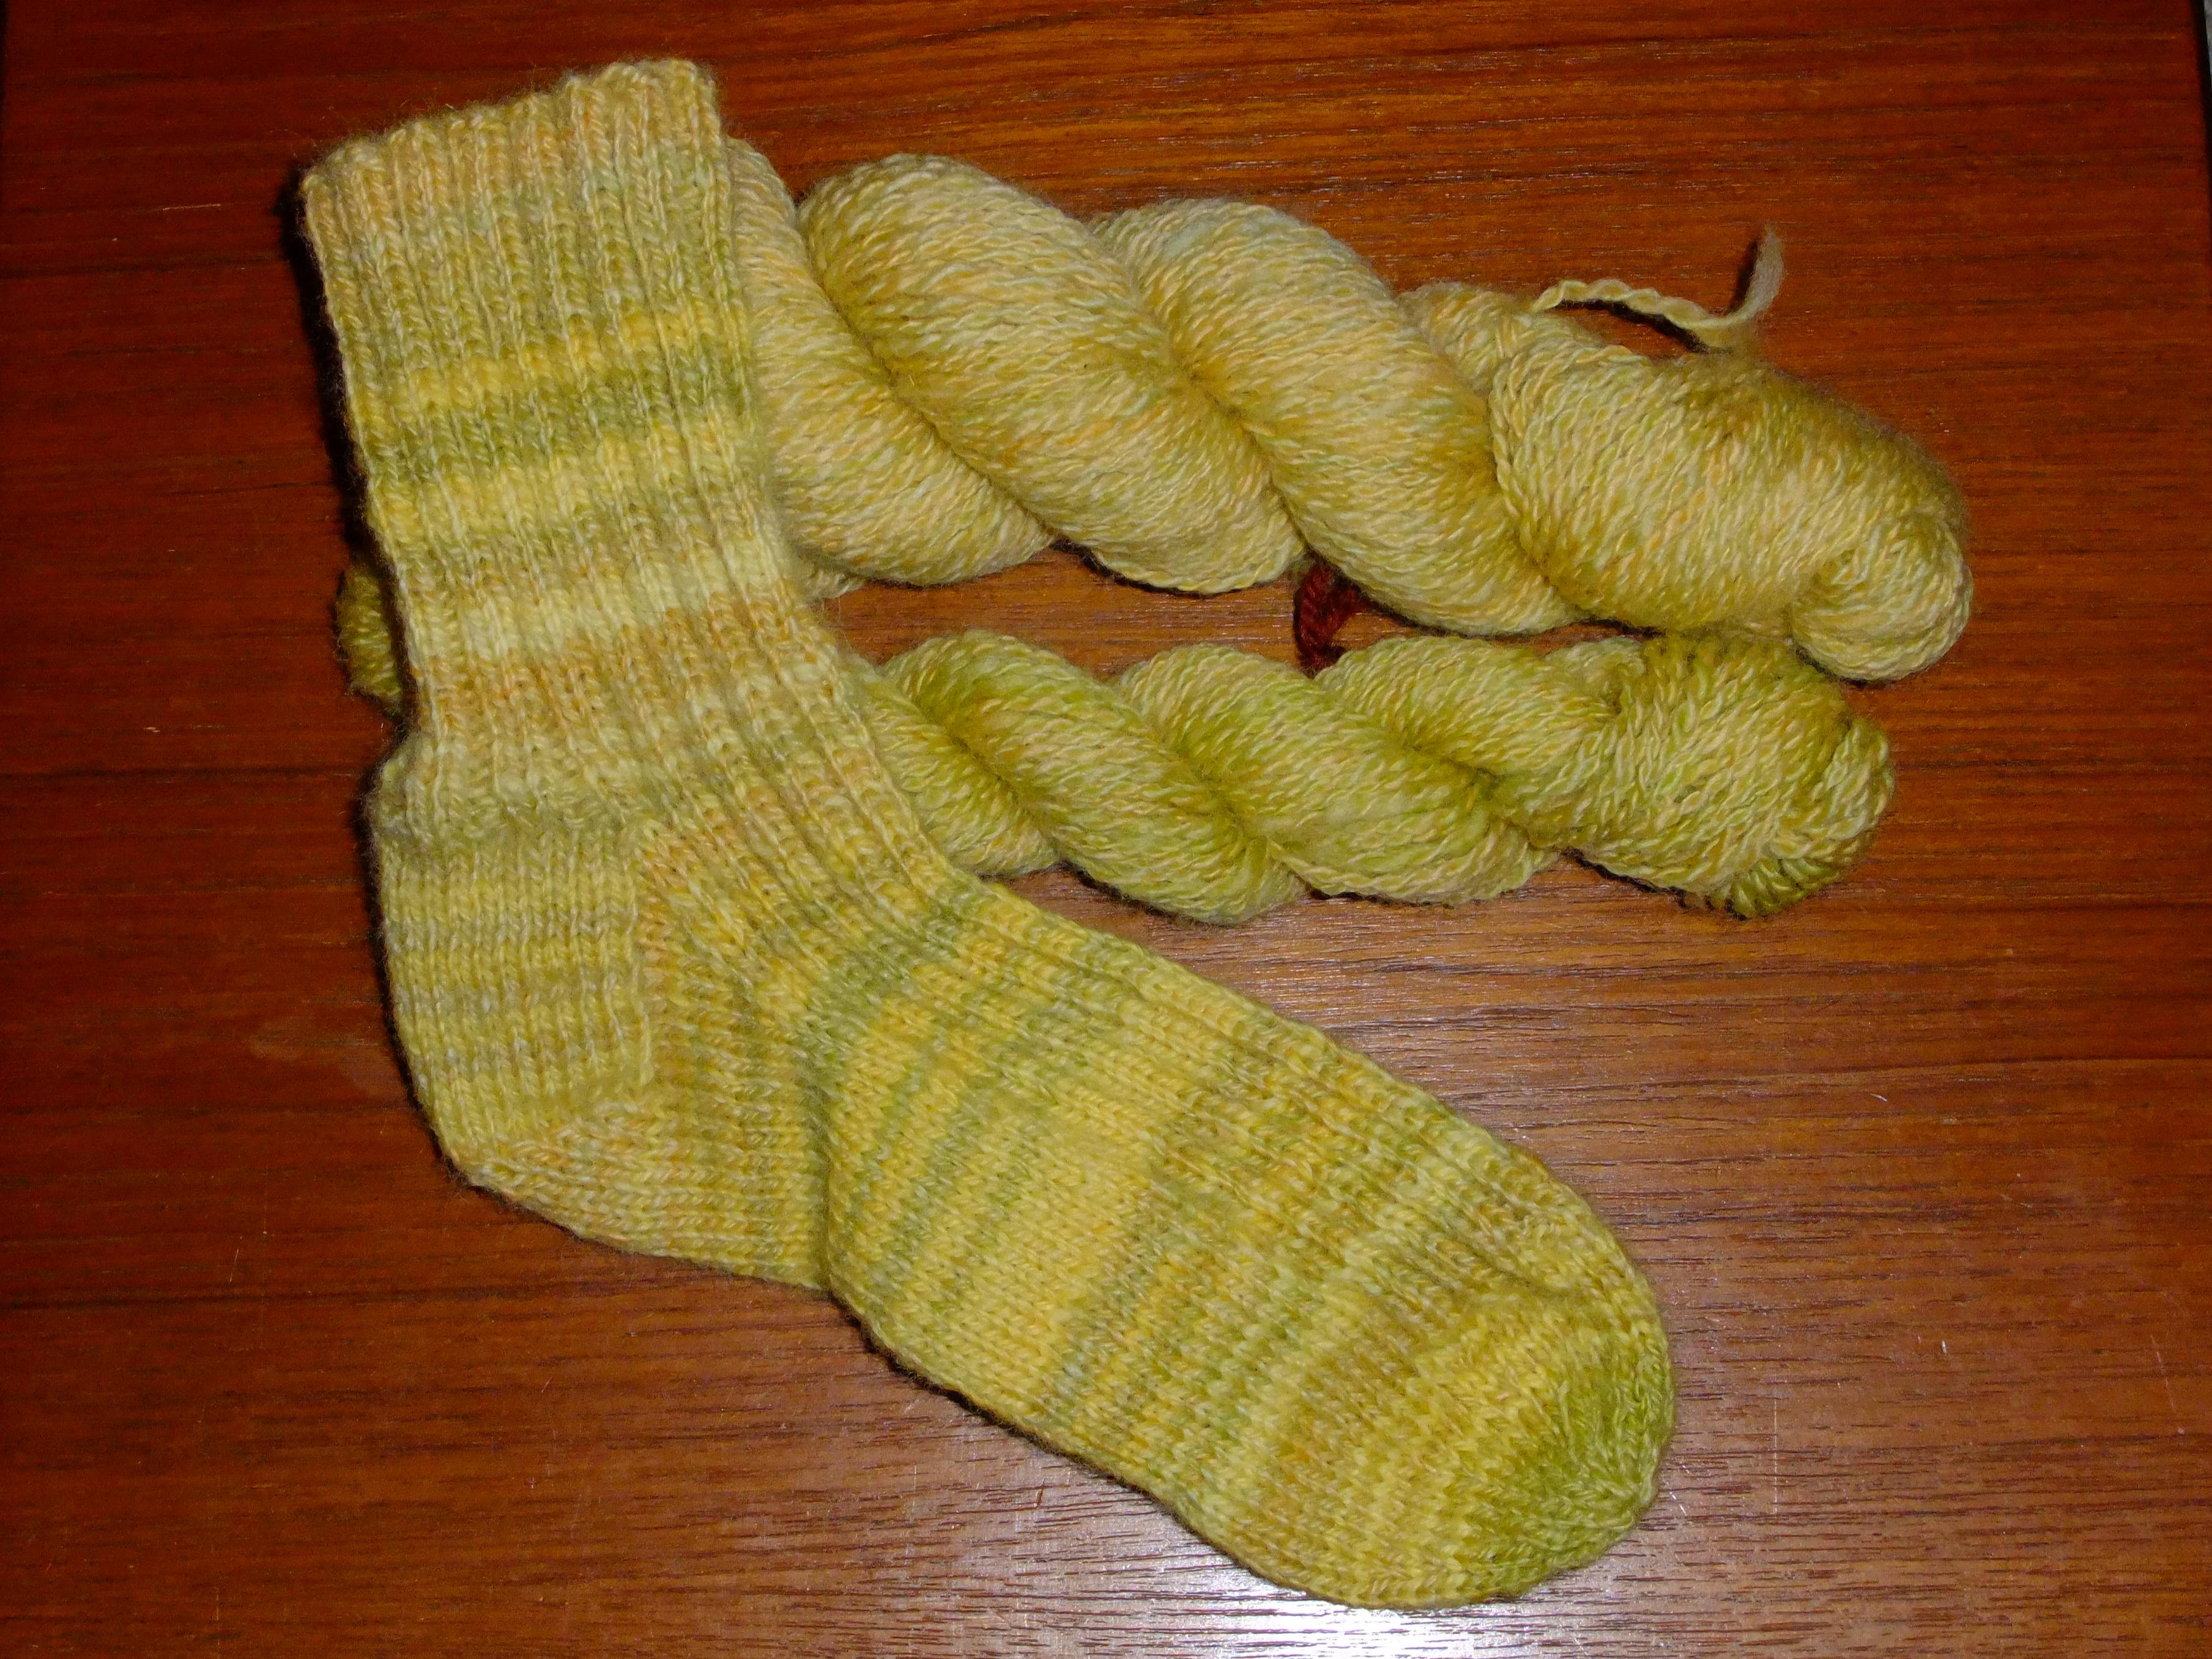 Debbie's hand-dyed, handspun socks